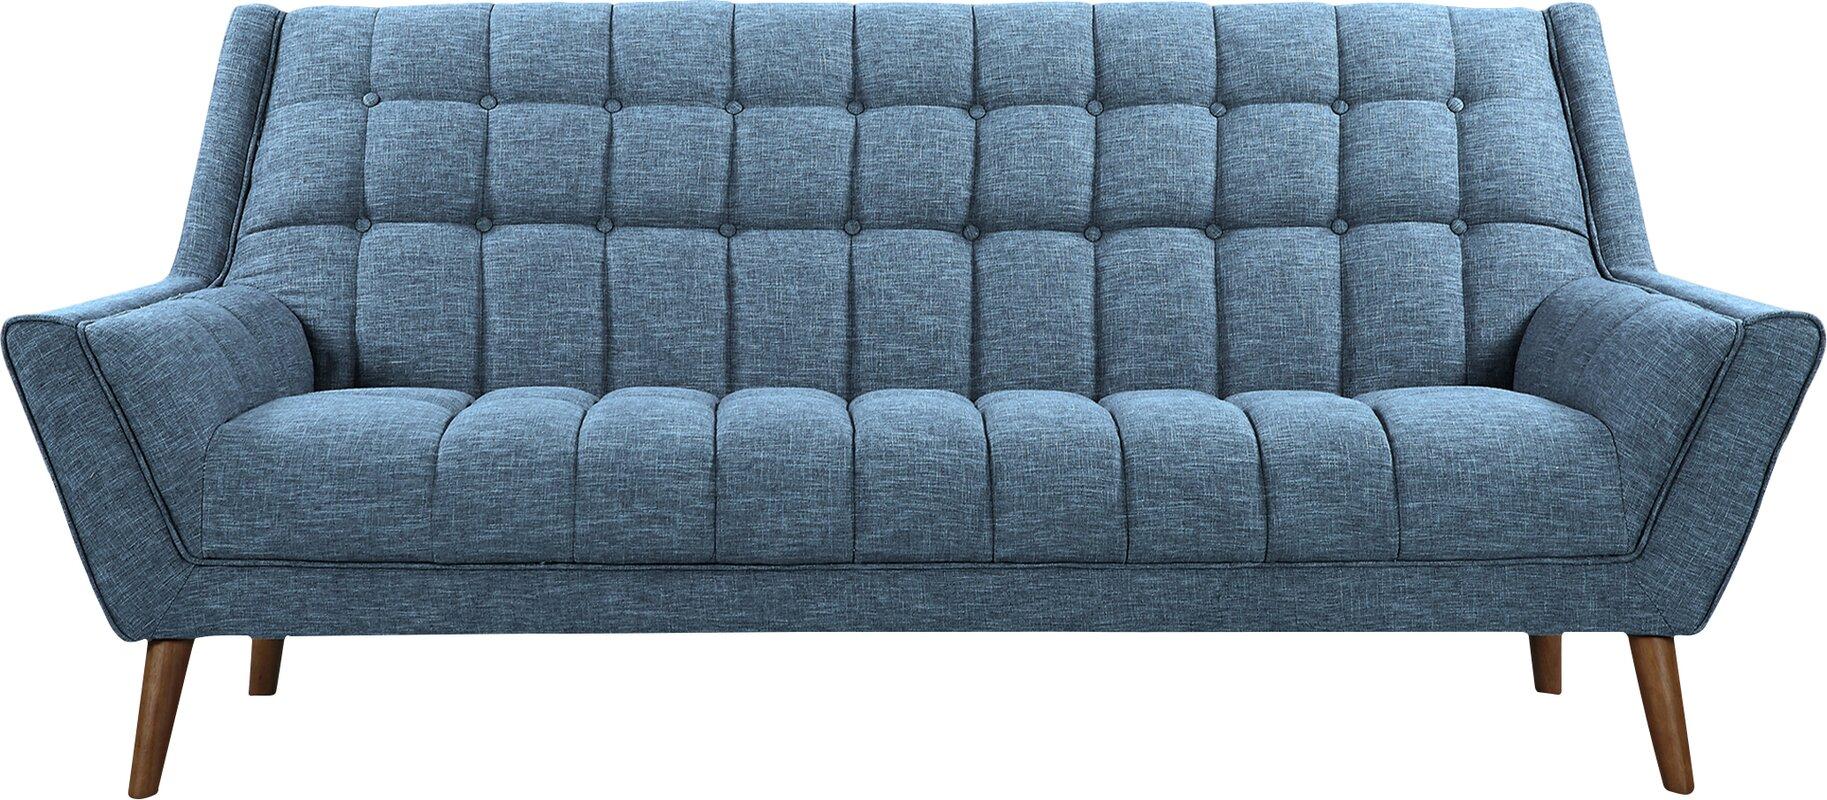 Demesne Mid Century Modern Sofa